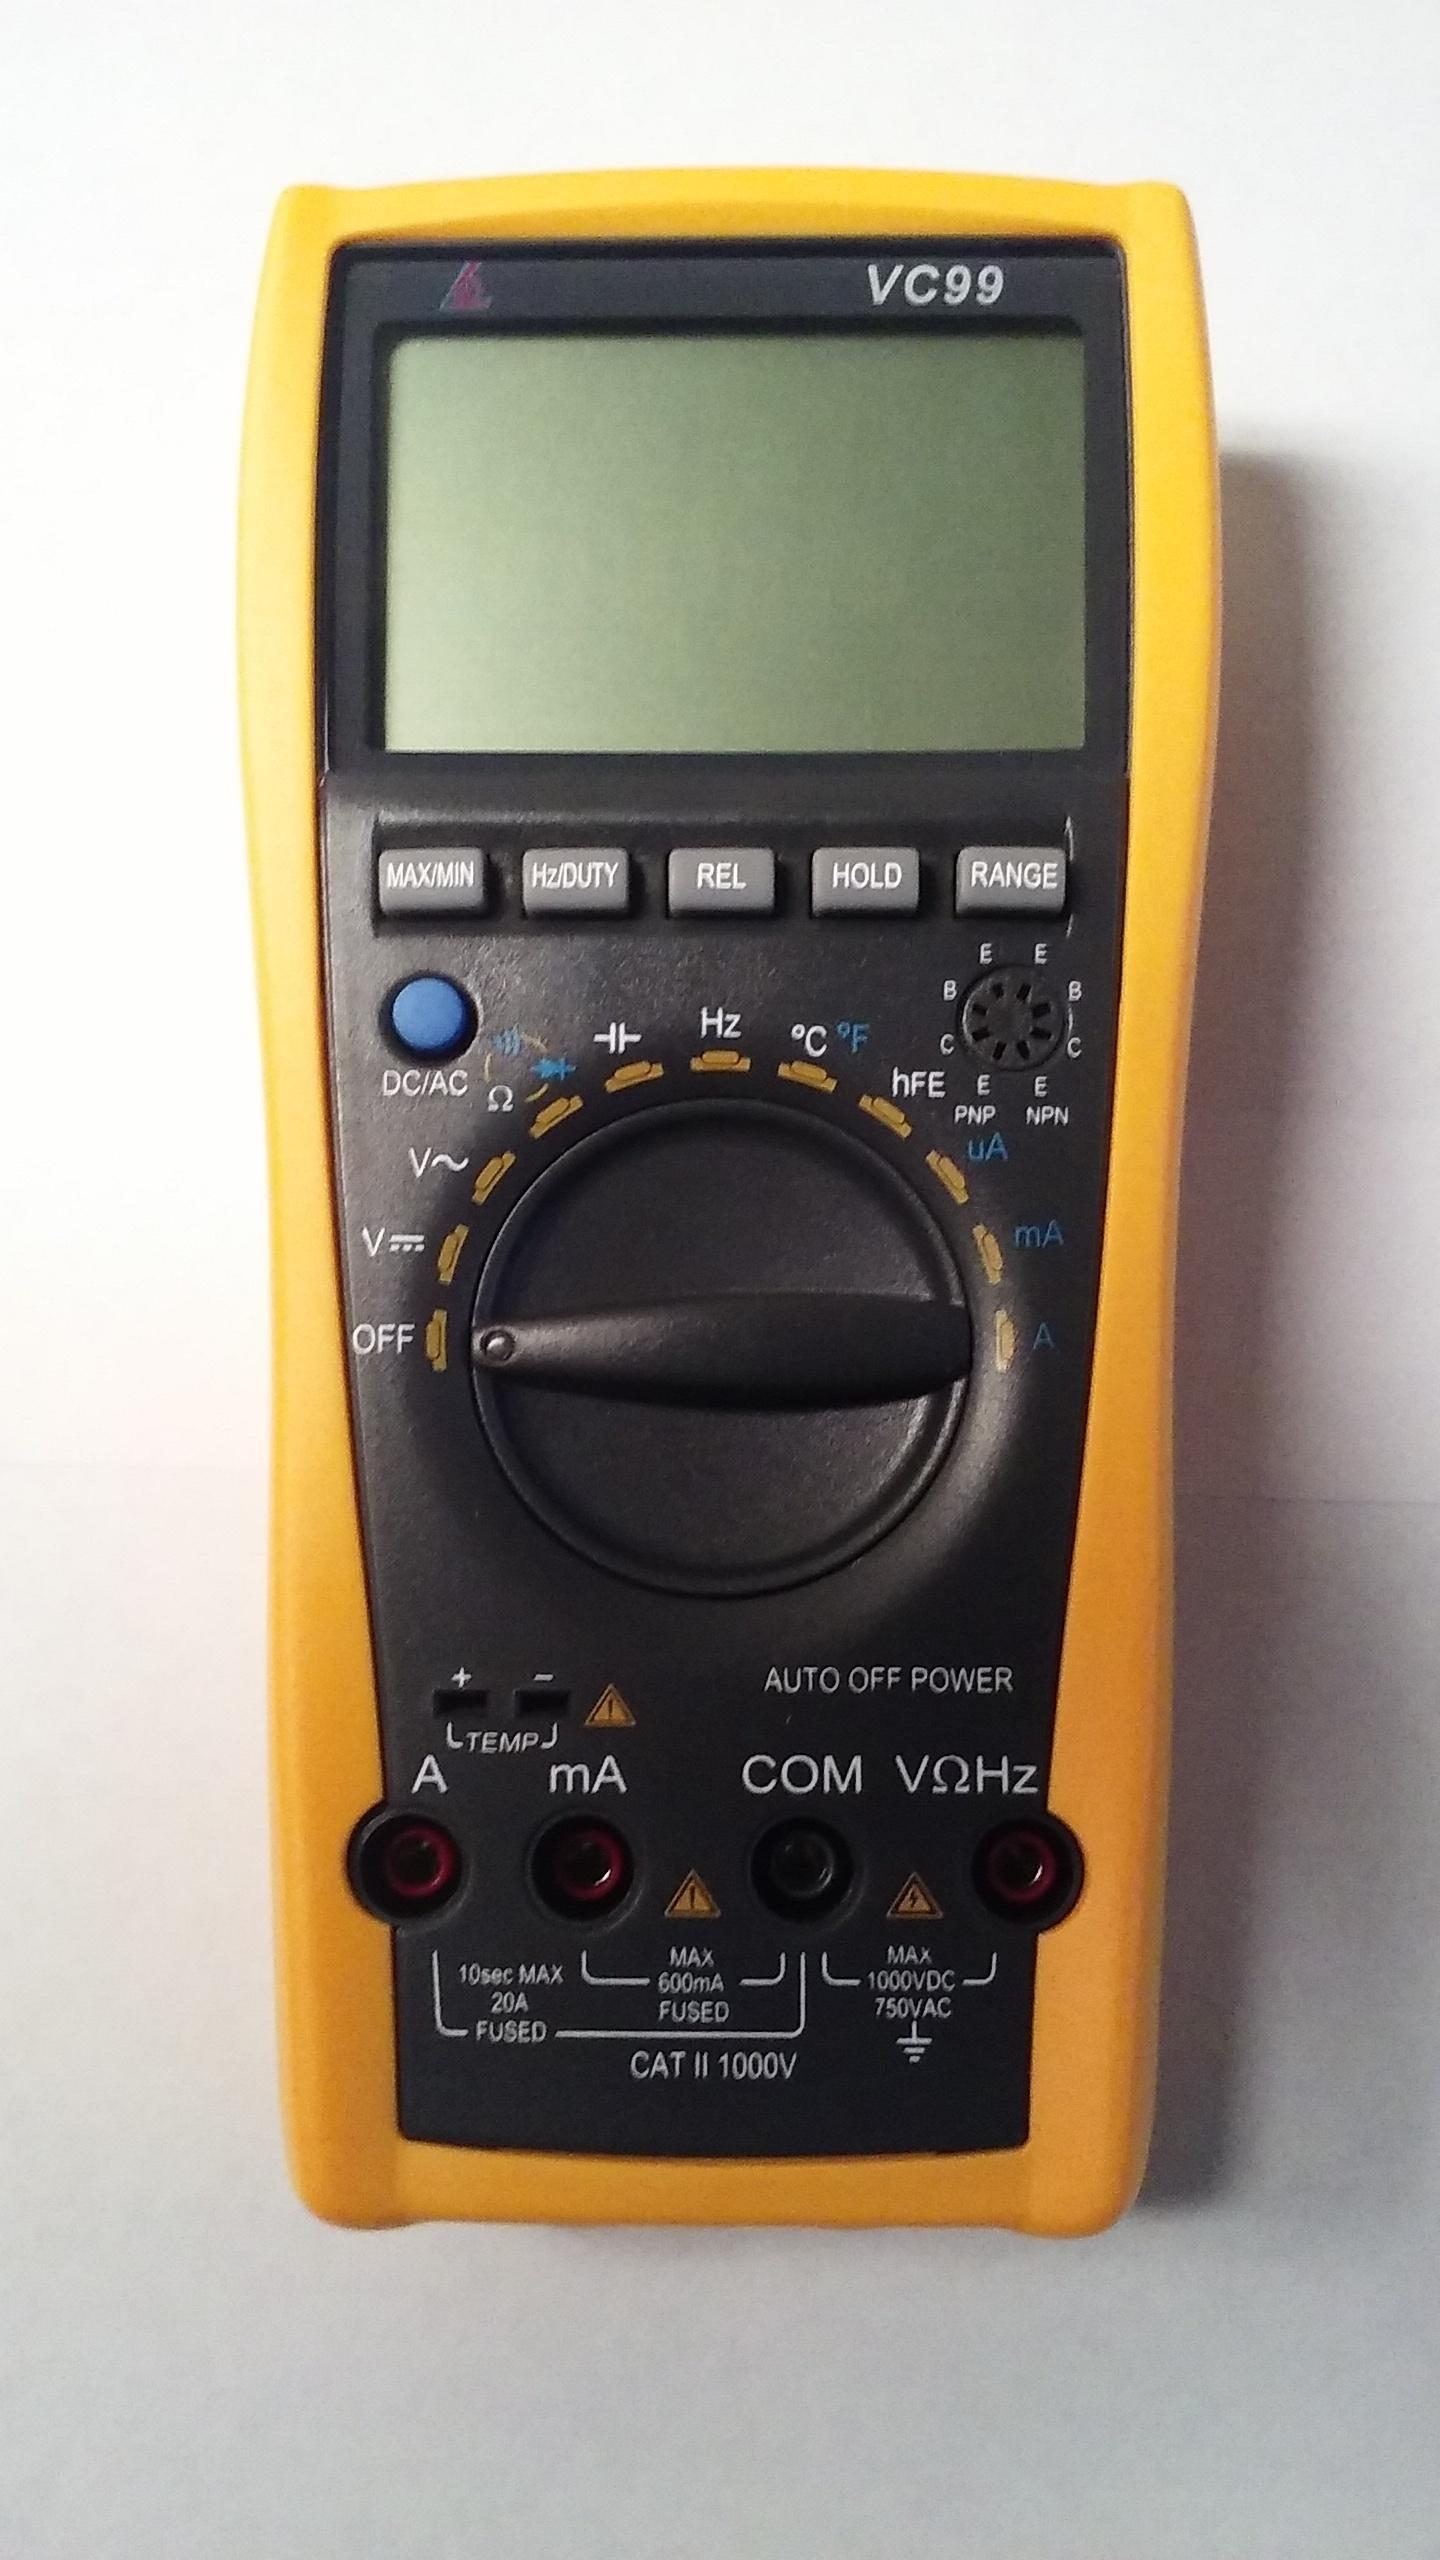 Signstek VC99 3 6/7 LCD Manual Auto Digital Multimeter Tester Volt Ammeter Test Meter Ohm Analog Bar Auto Range